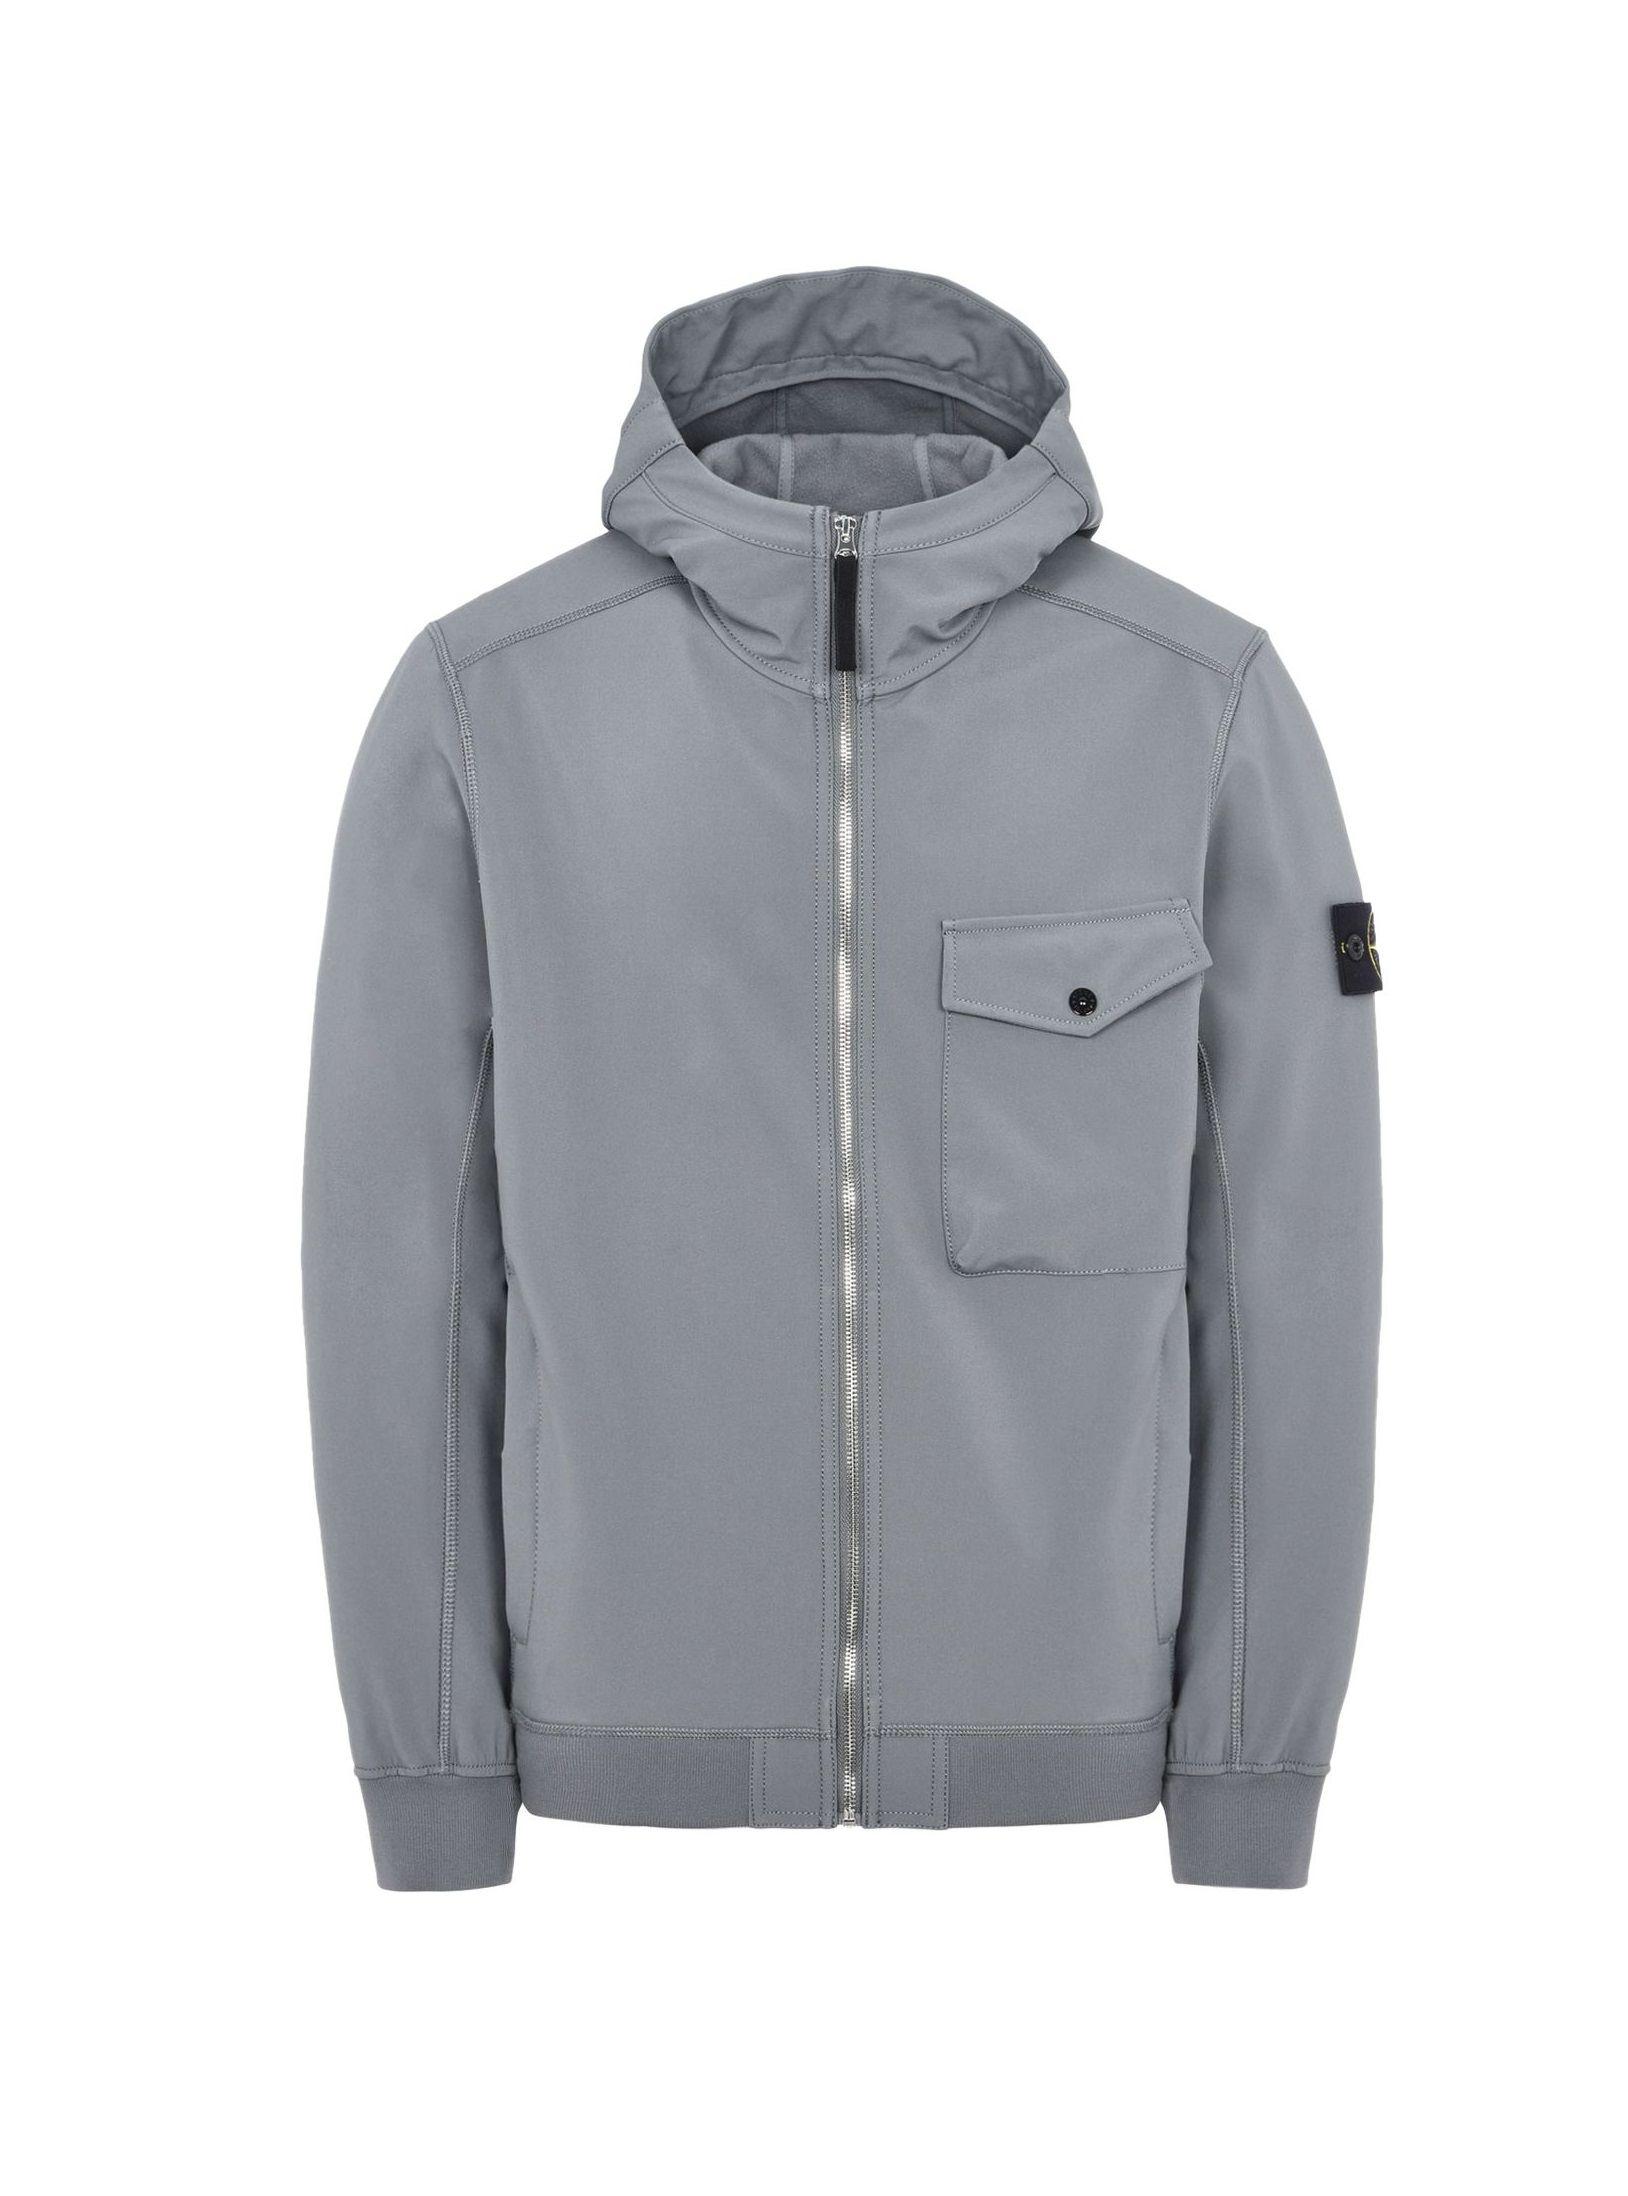 1d60c21661 Felpa Stone Island soft shell r grigio jersey 6715q0622 v0060 fw 17 ...